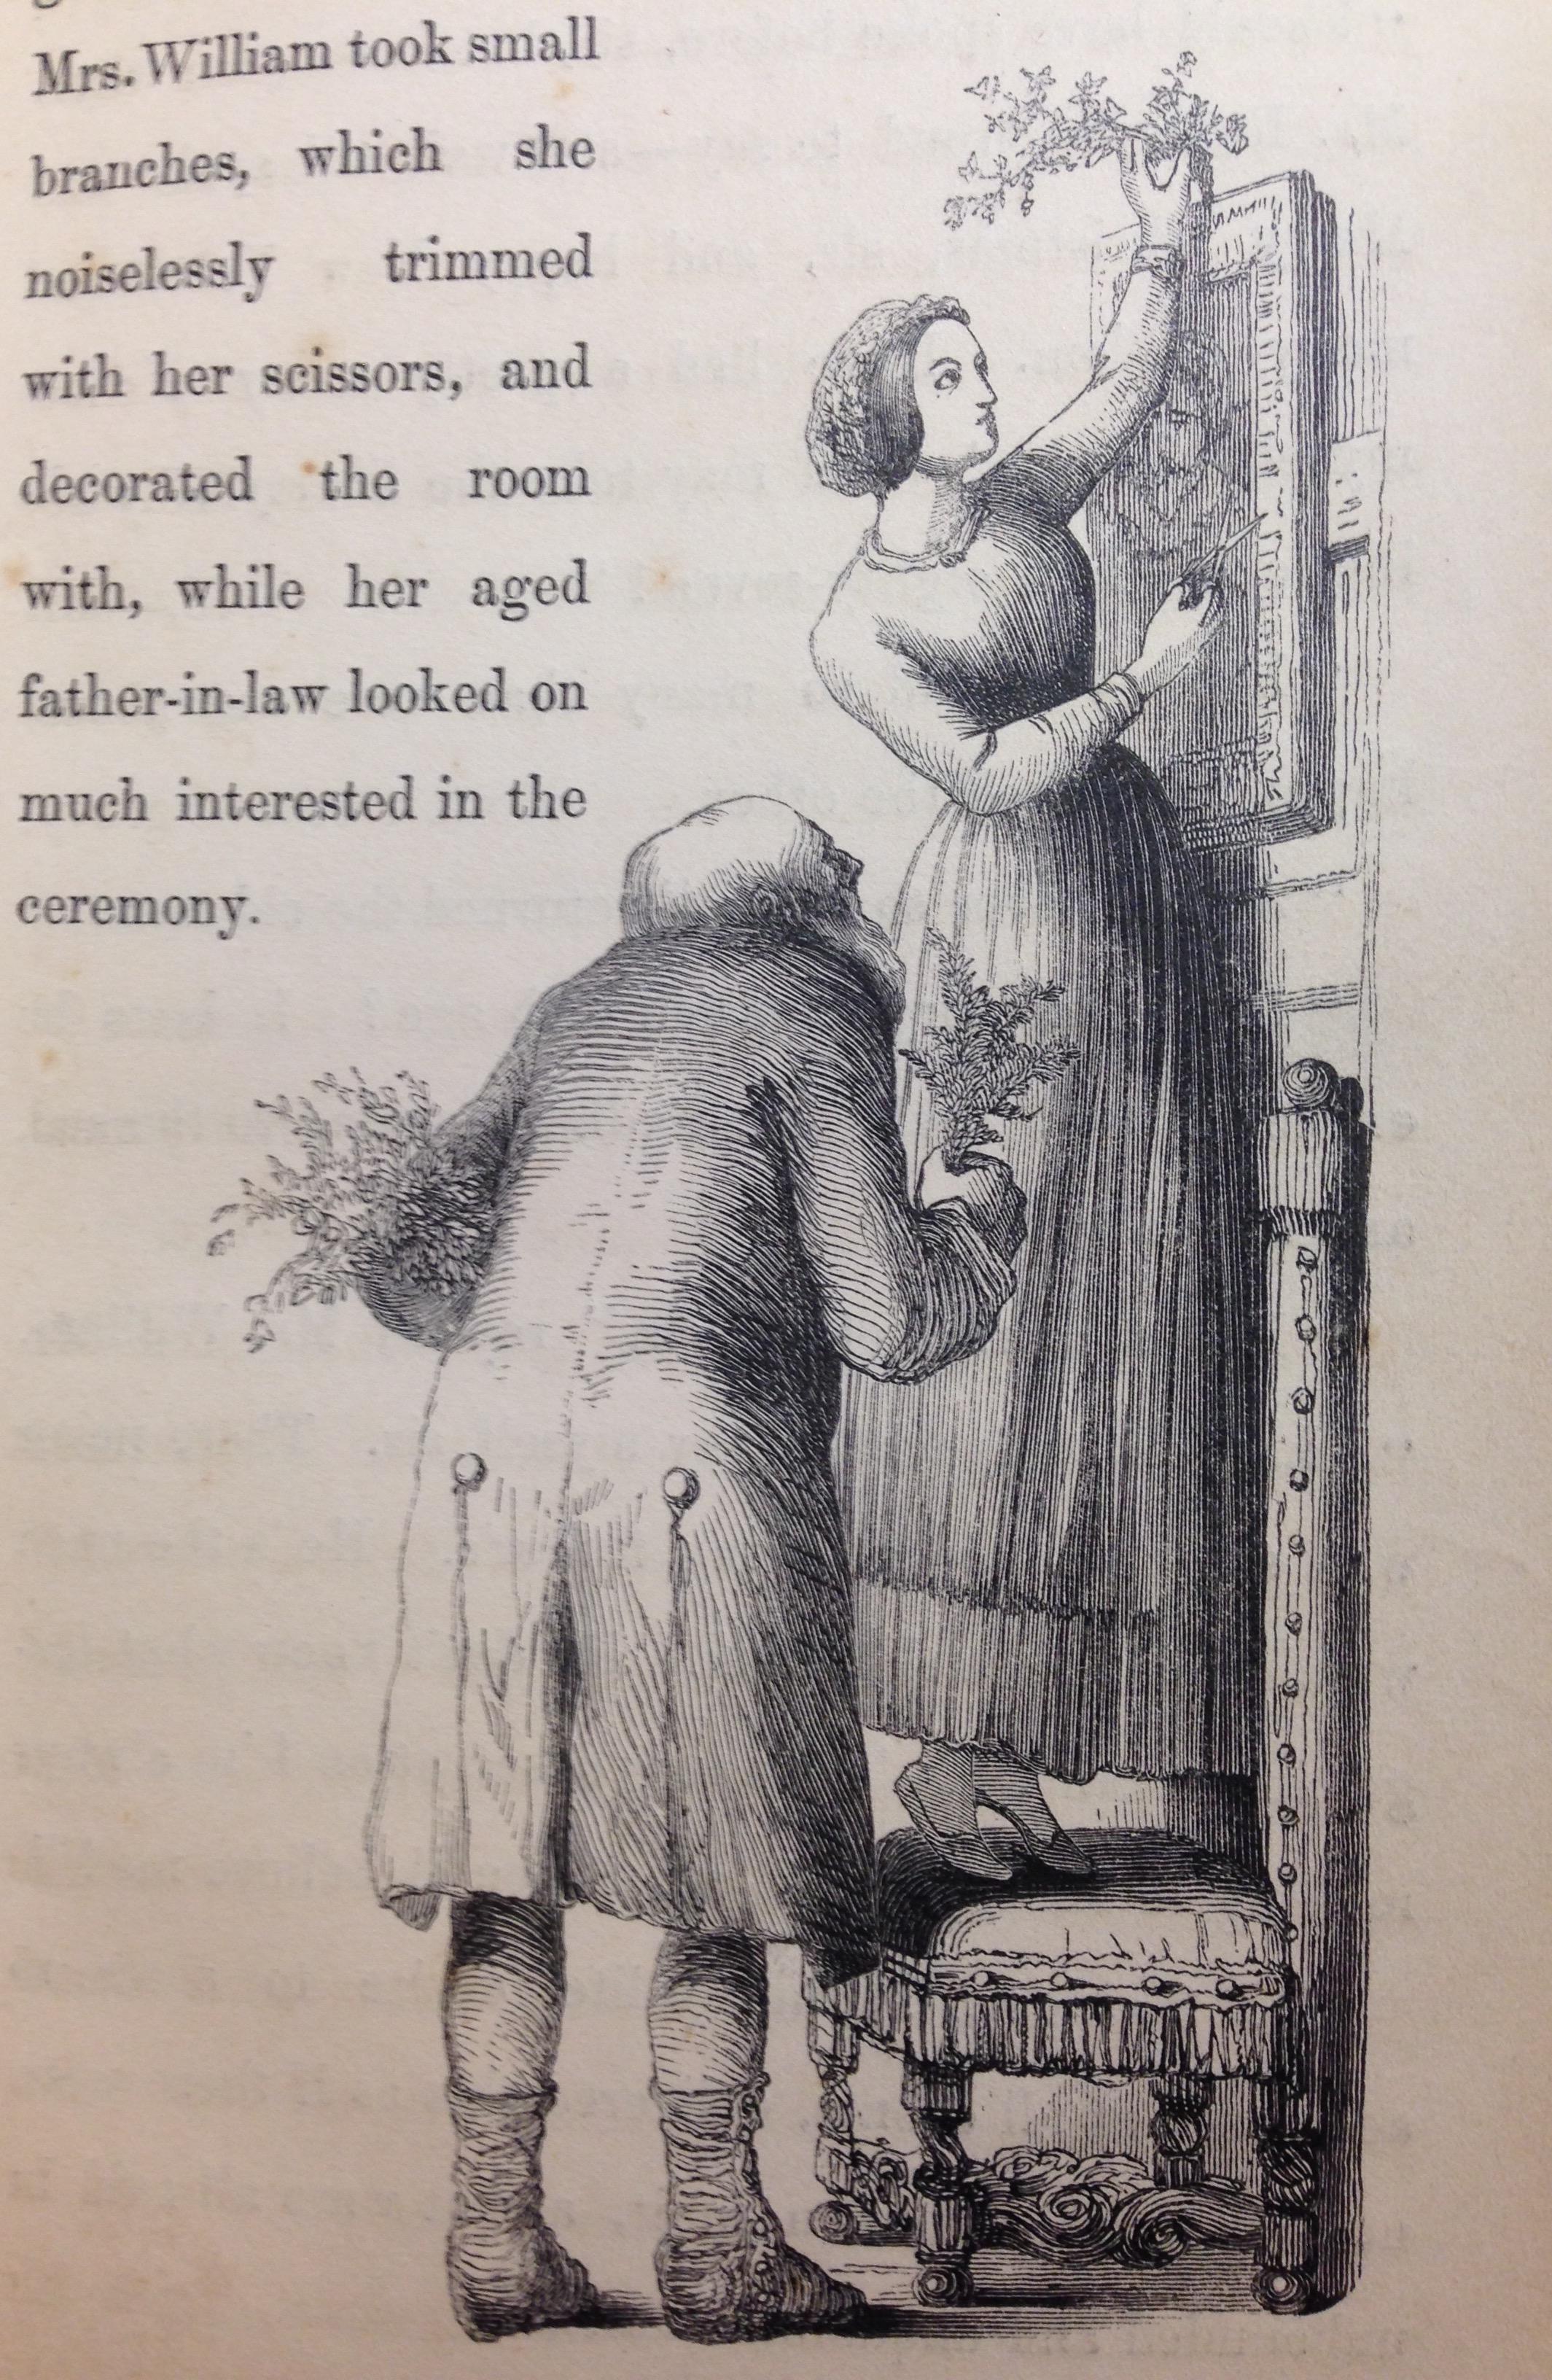 Sanskrit Of The Vedas Vs Modern Sanskrit: Victorian Era Christmas Books At The Indiana State Library